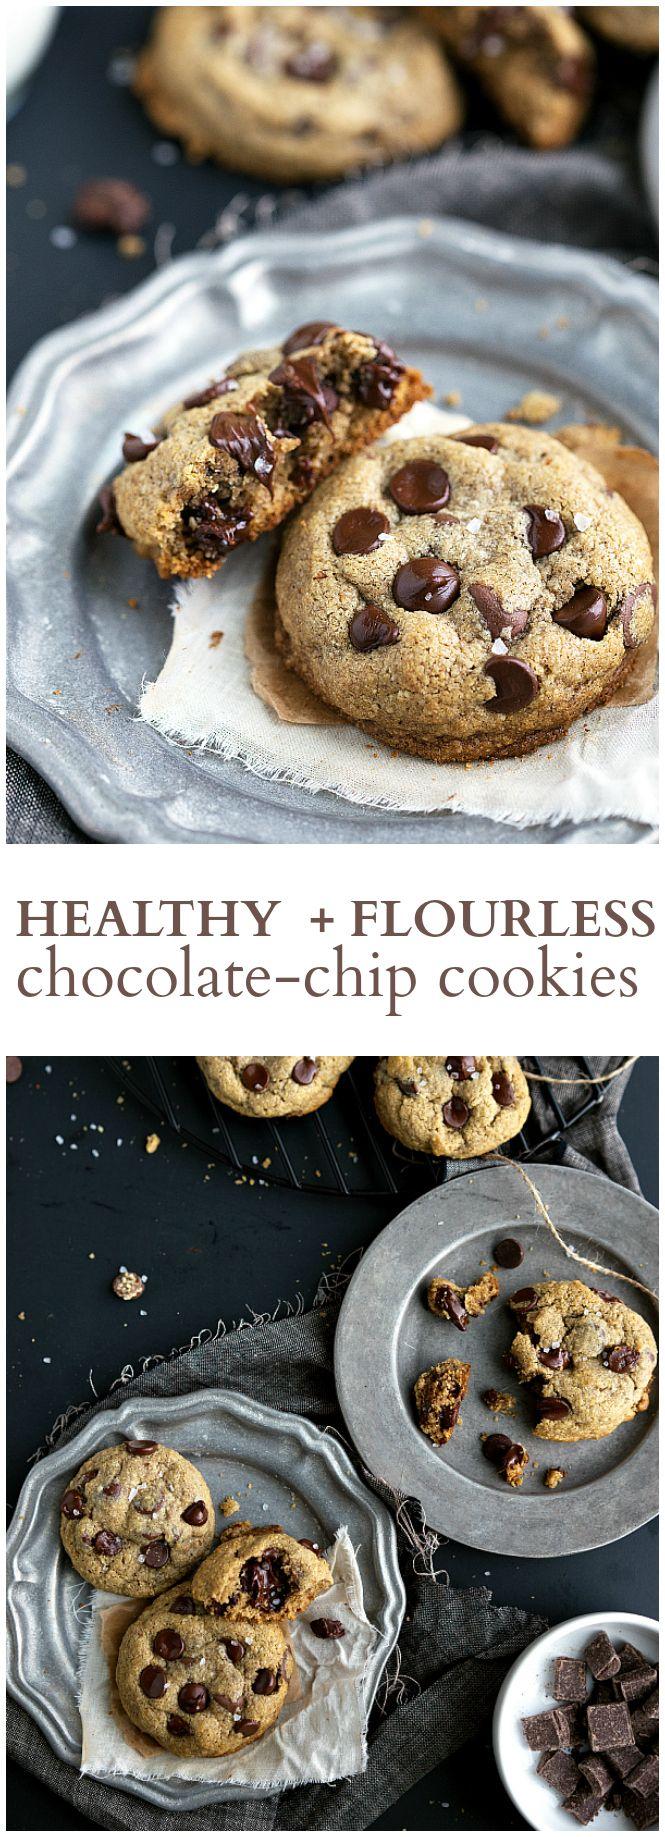 White apron menu oshawa - Best Ever Healthy Chocolate Chip Cookies